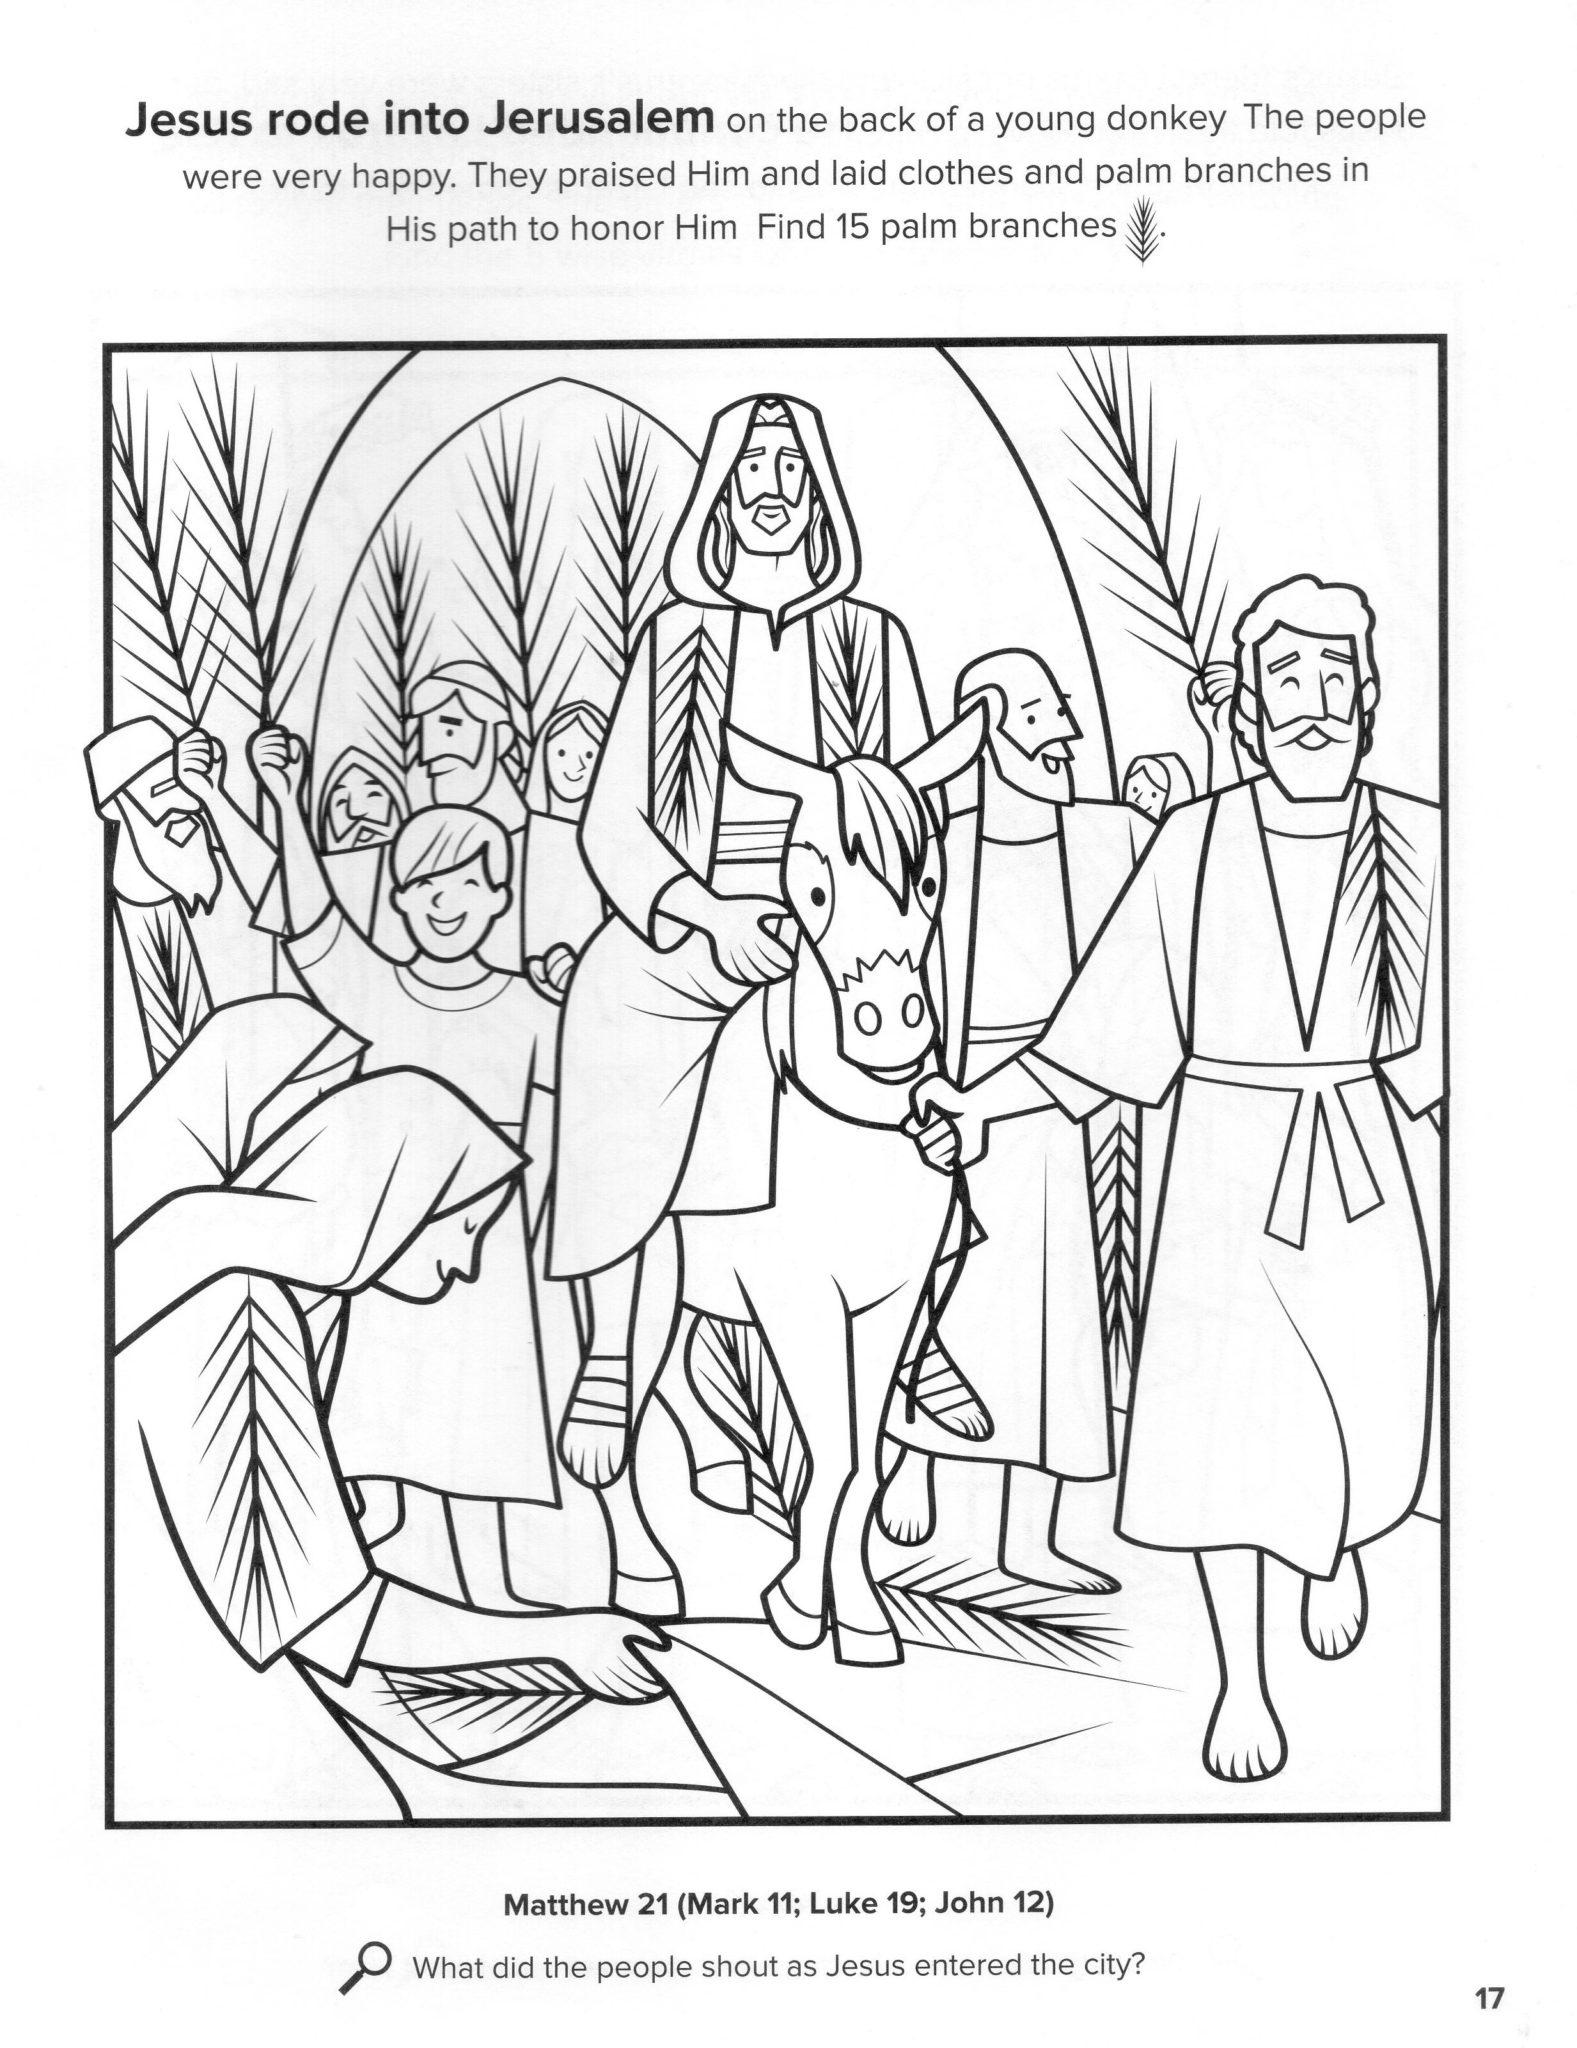 entrada triunfal cristo jesus pascua resurreccion